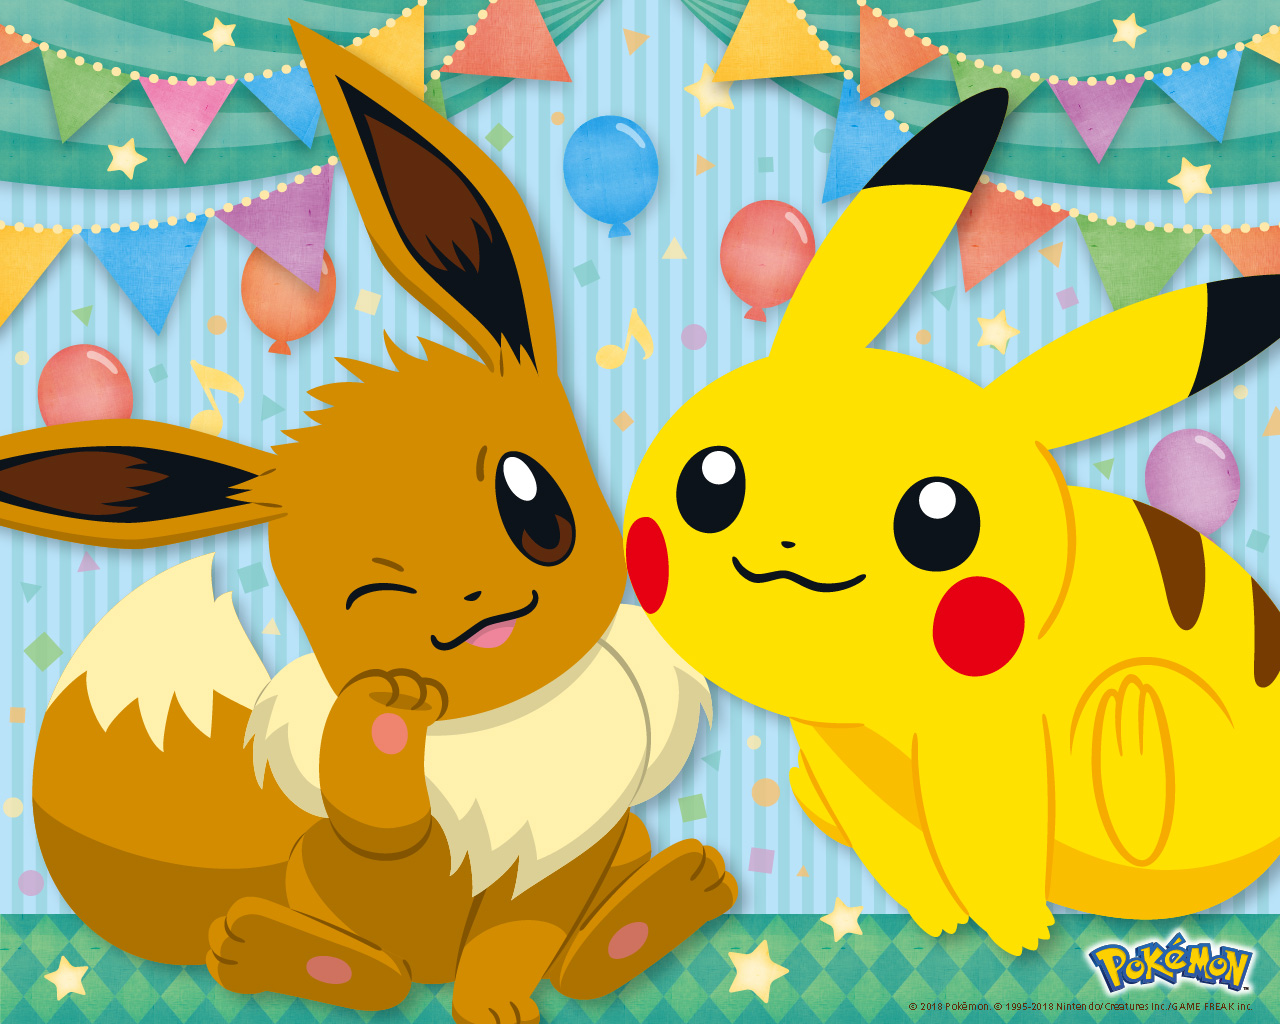 Animal Print Desktop Wallpaper Pokemon Splatoon 2 And Animal Crossing Happy Birthday